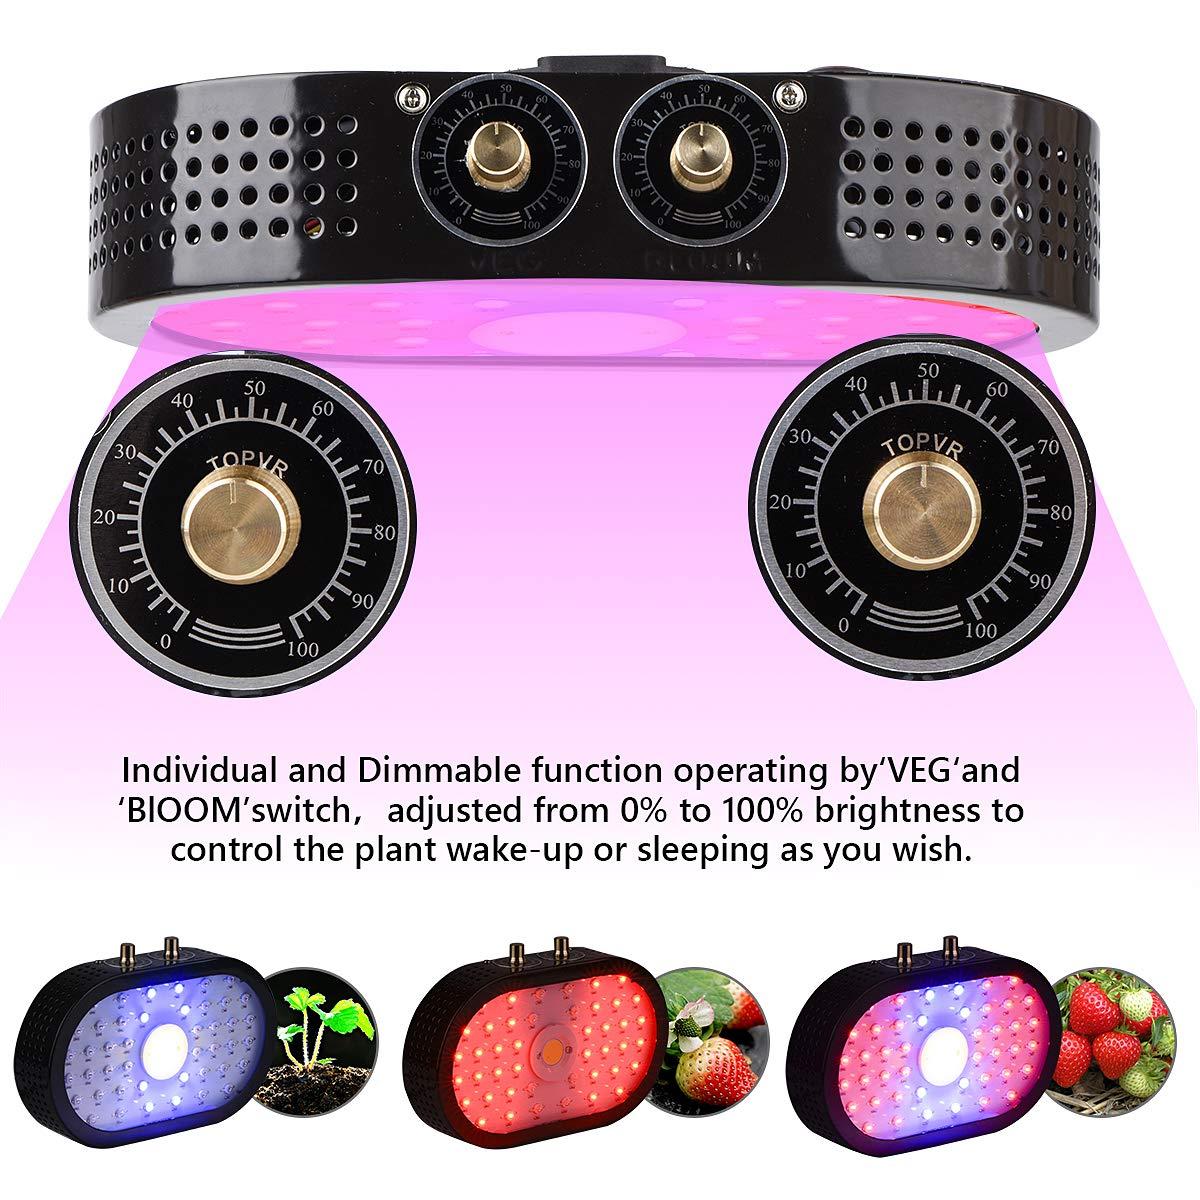 LED Grow Light for Indoor Plants 1100W COB Adjustable Full Spectrum Grow Light with Veg Bloom Switch